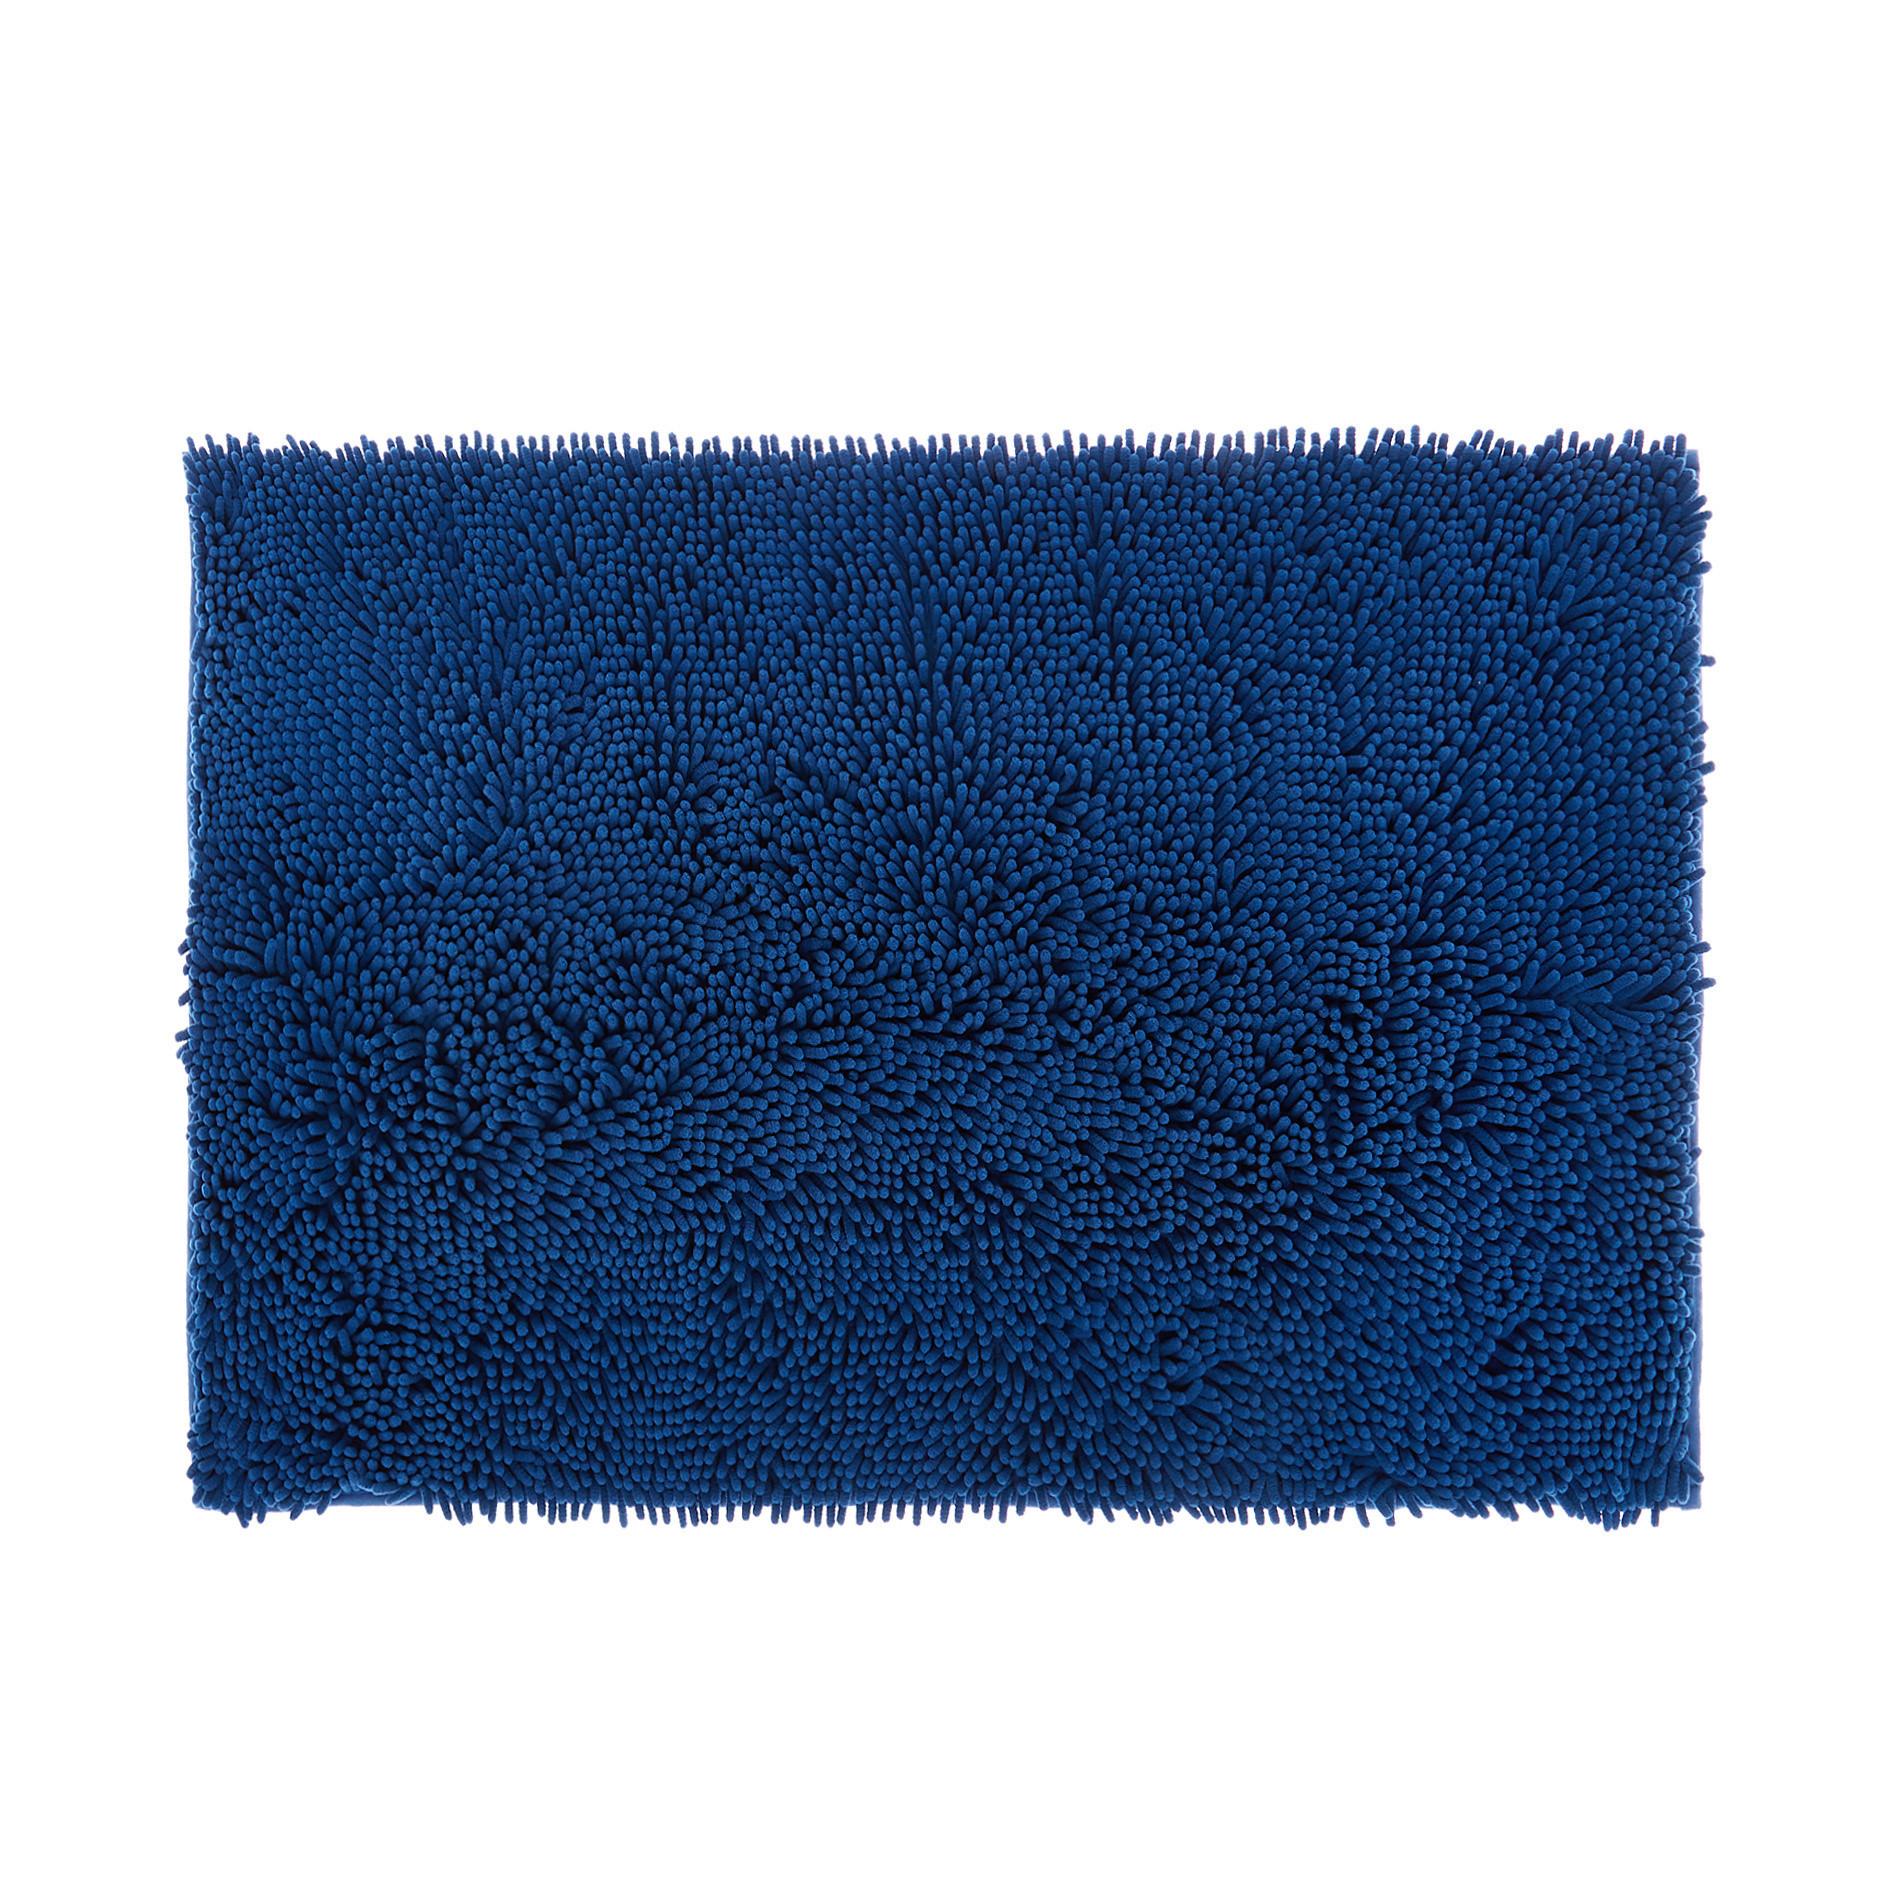 Tappeto bagno microfibra shaggy, Blu, large image number 0